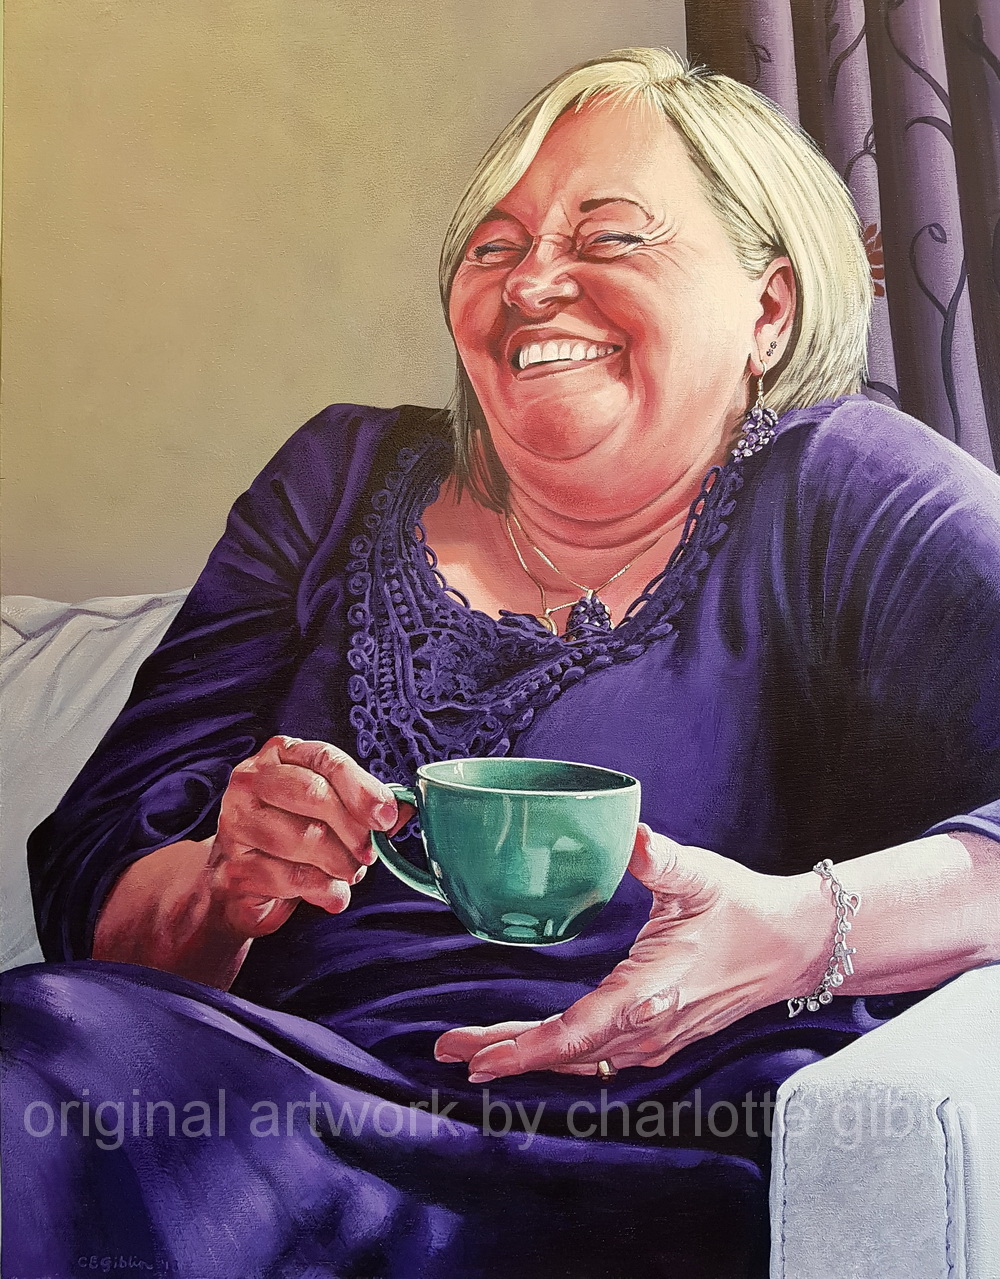 The Joy of Making Brigitte Laugh 900 x 700mm acrylic on ply frame $4,990